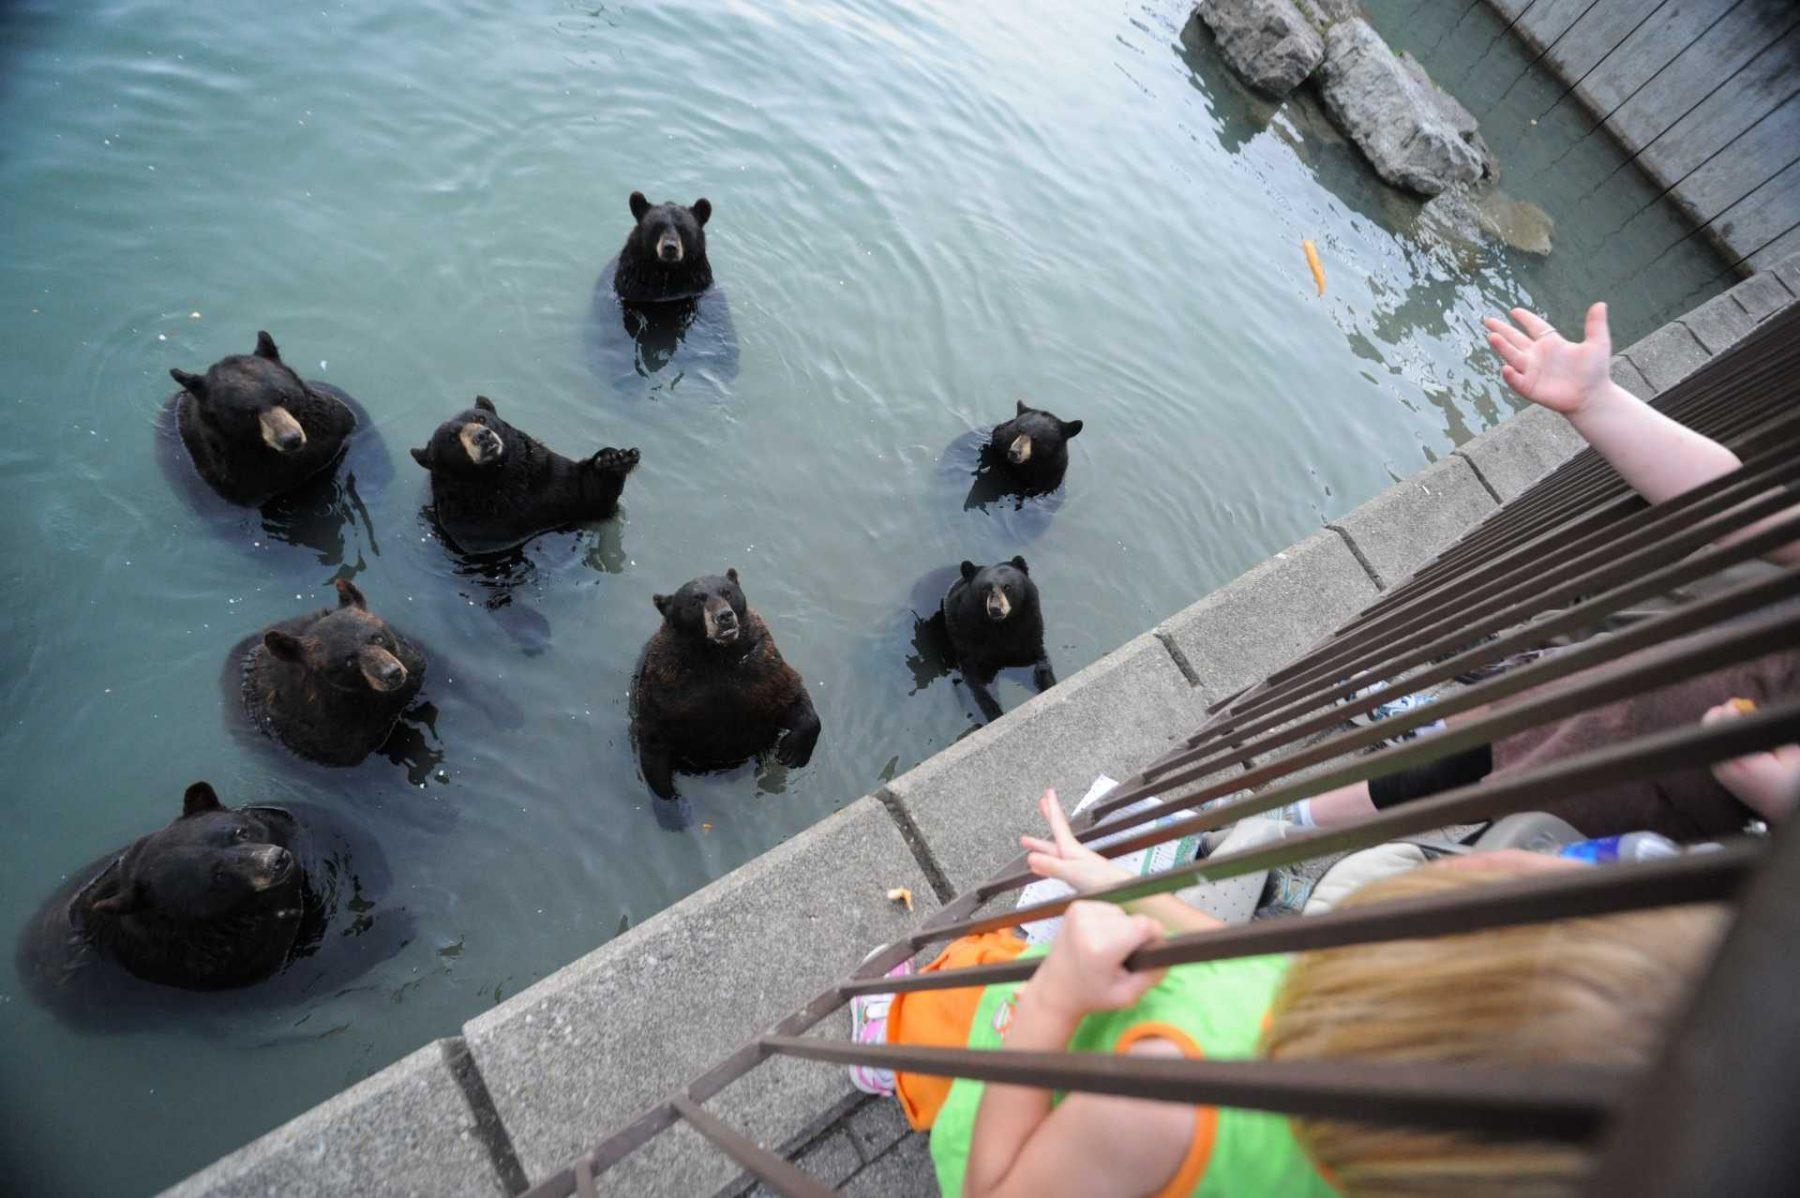 Visitors through junk food to begging bears at Marineland. Canada, 2012.